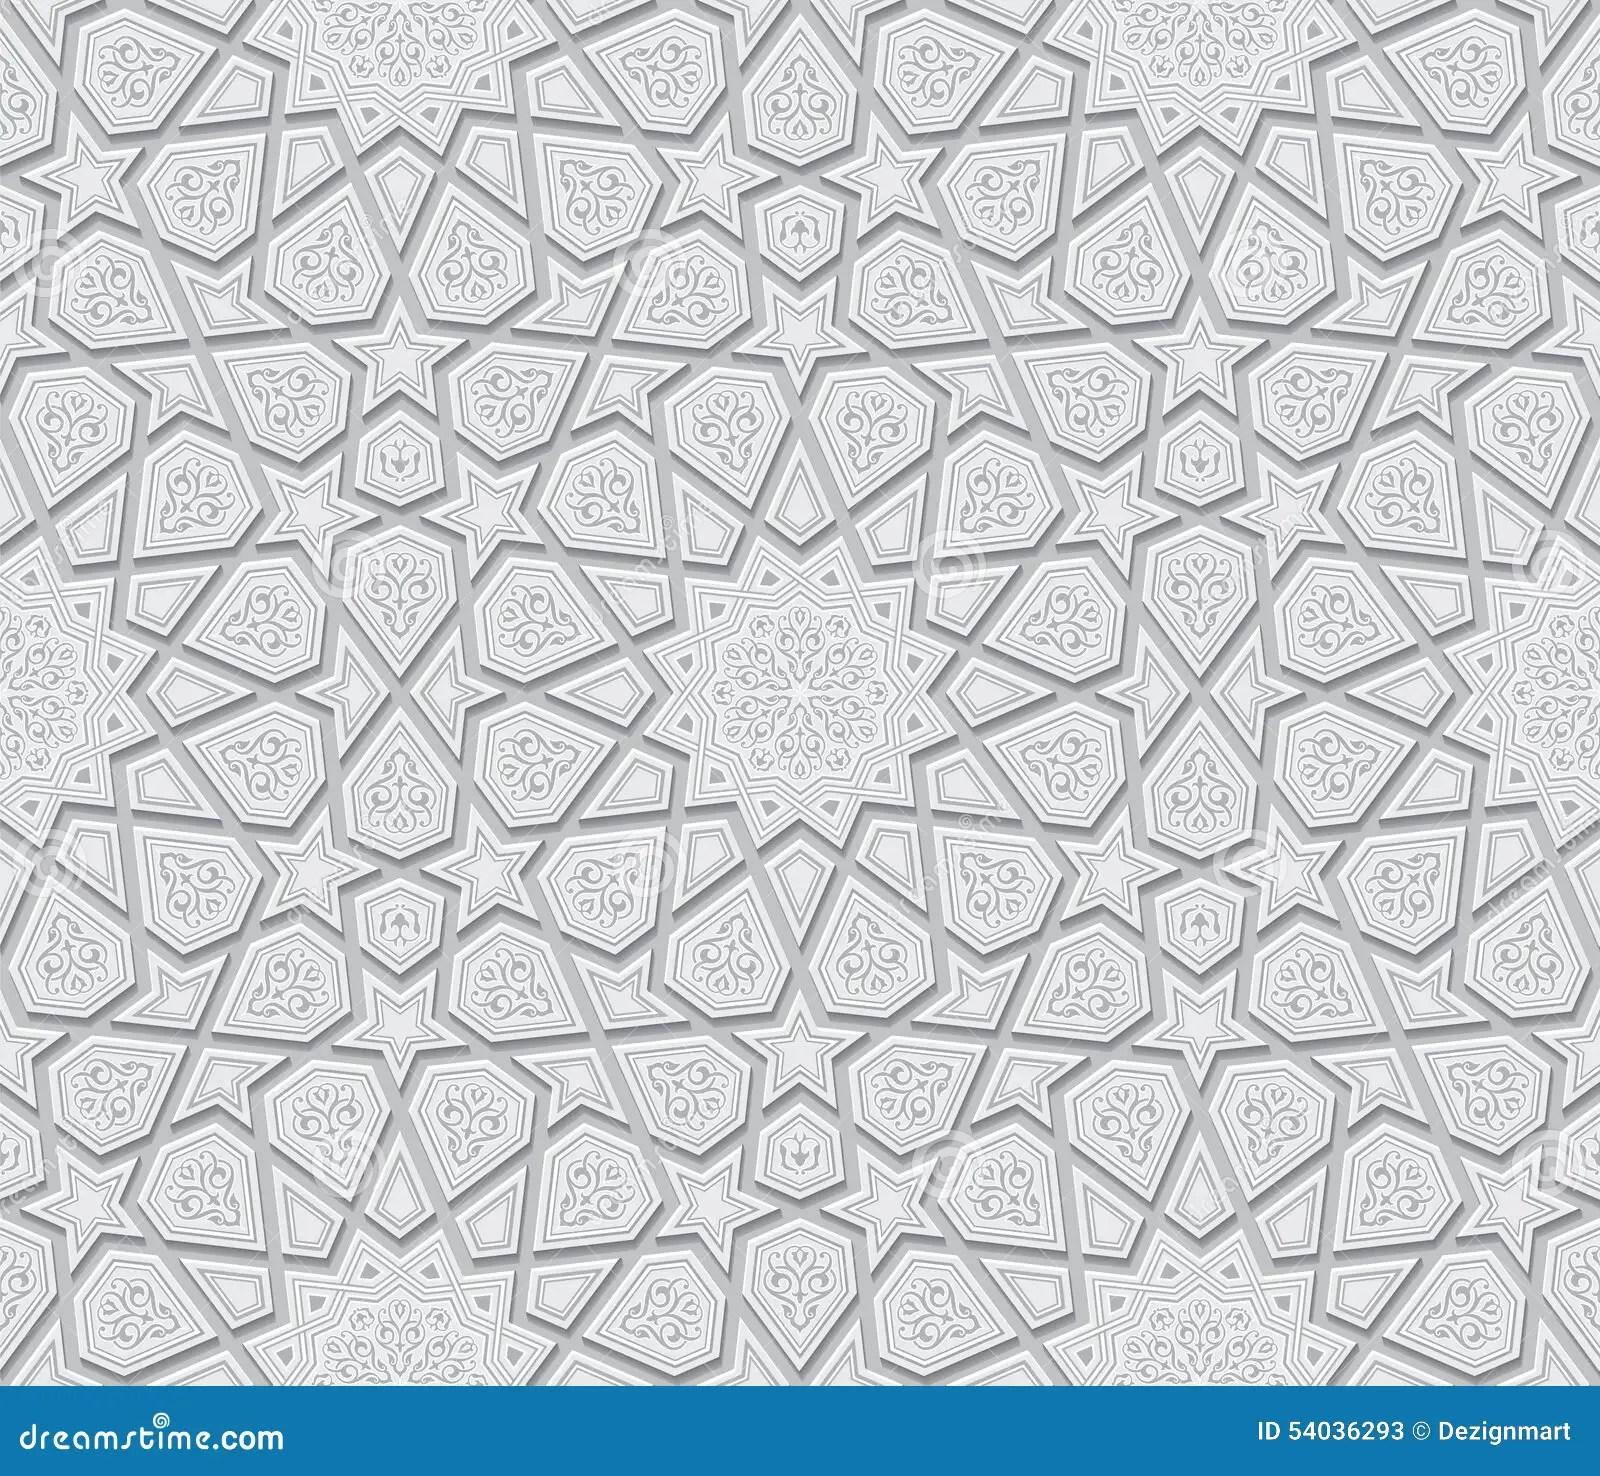 Islamic Star Ornament Light Grey Background Stock Vector